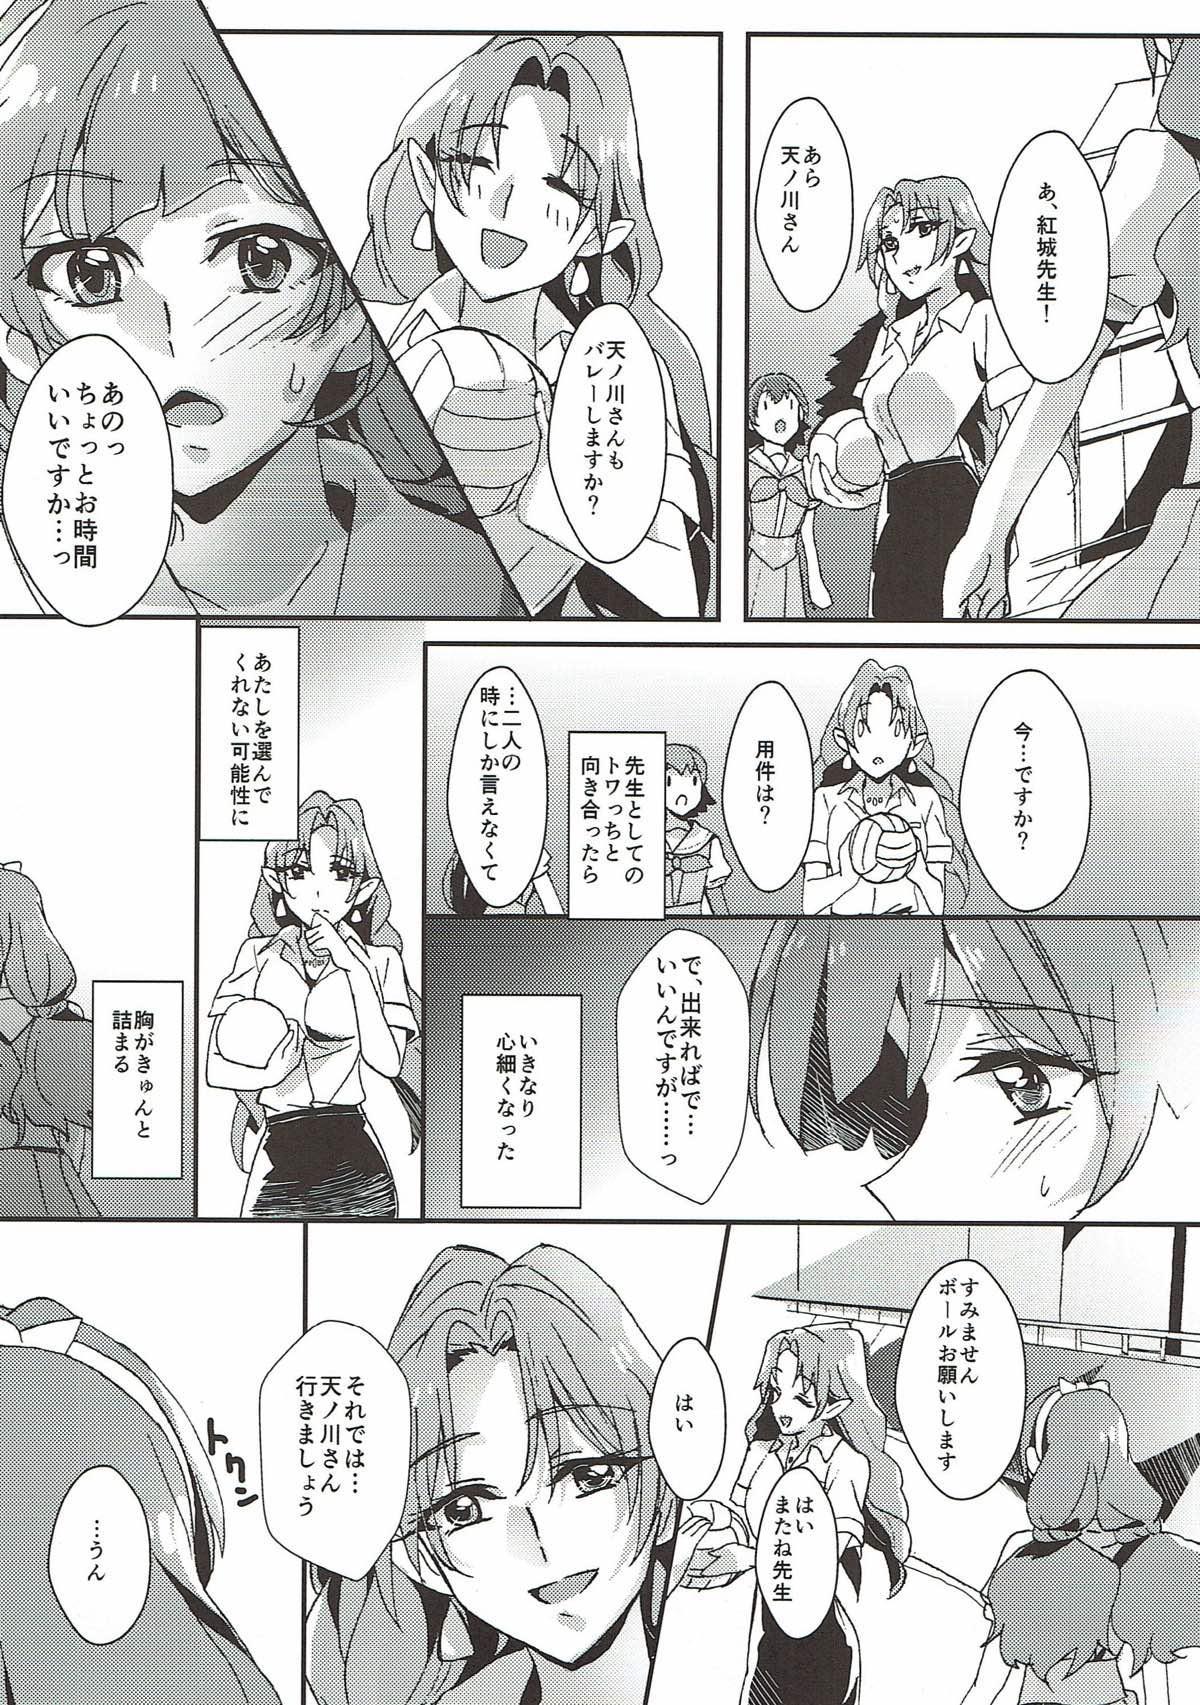 Sensei to Atashi 56